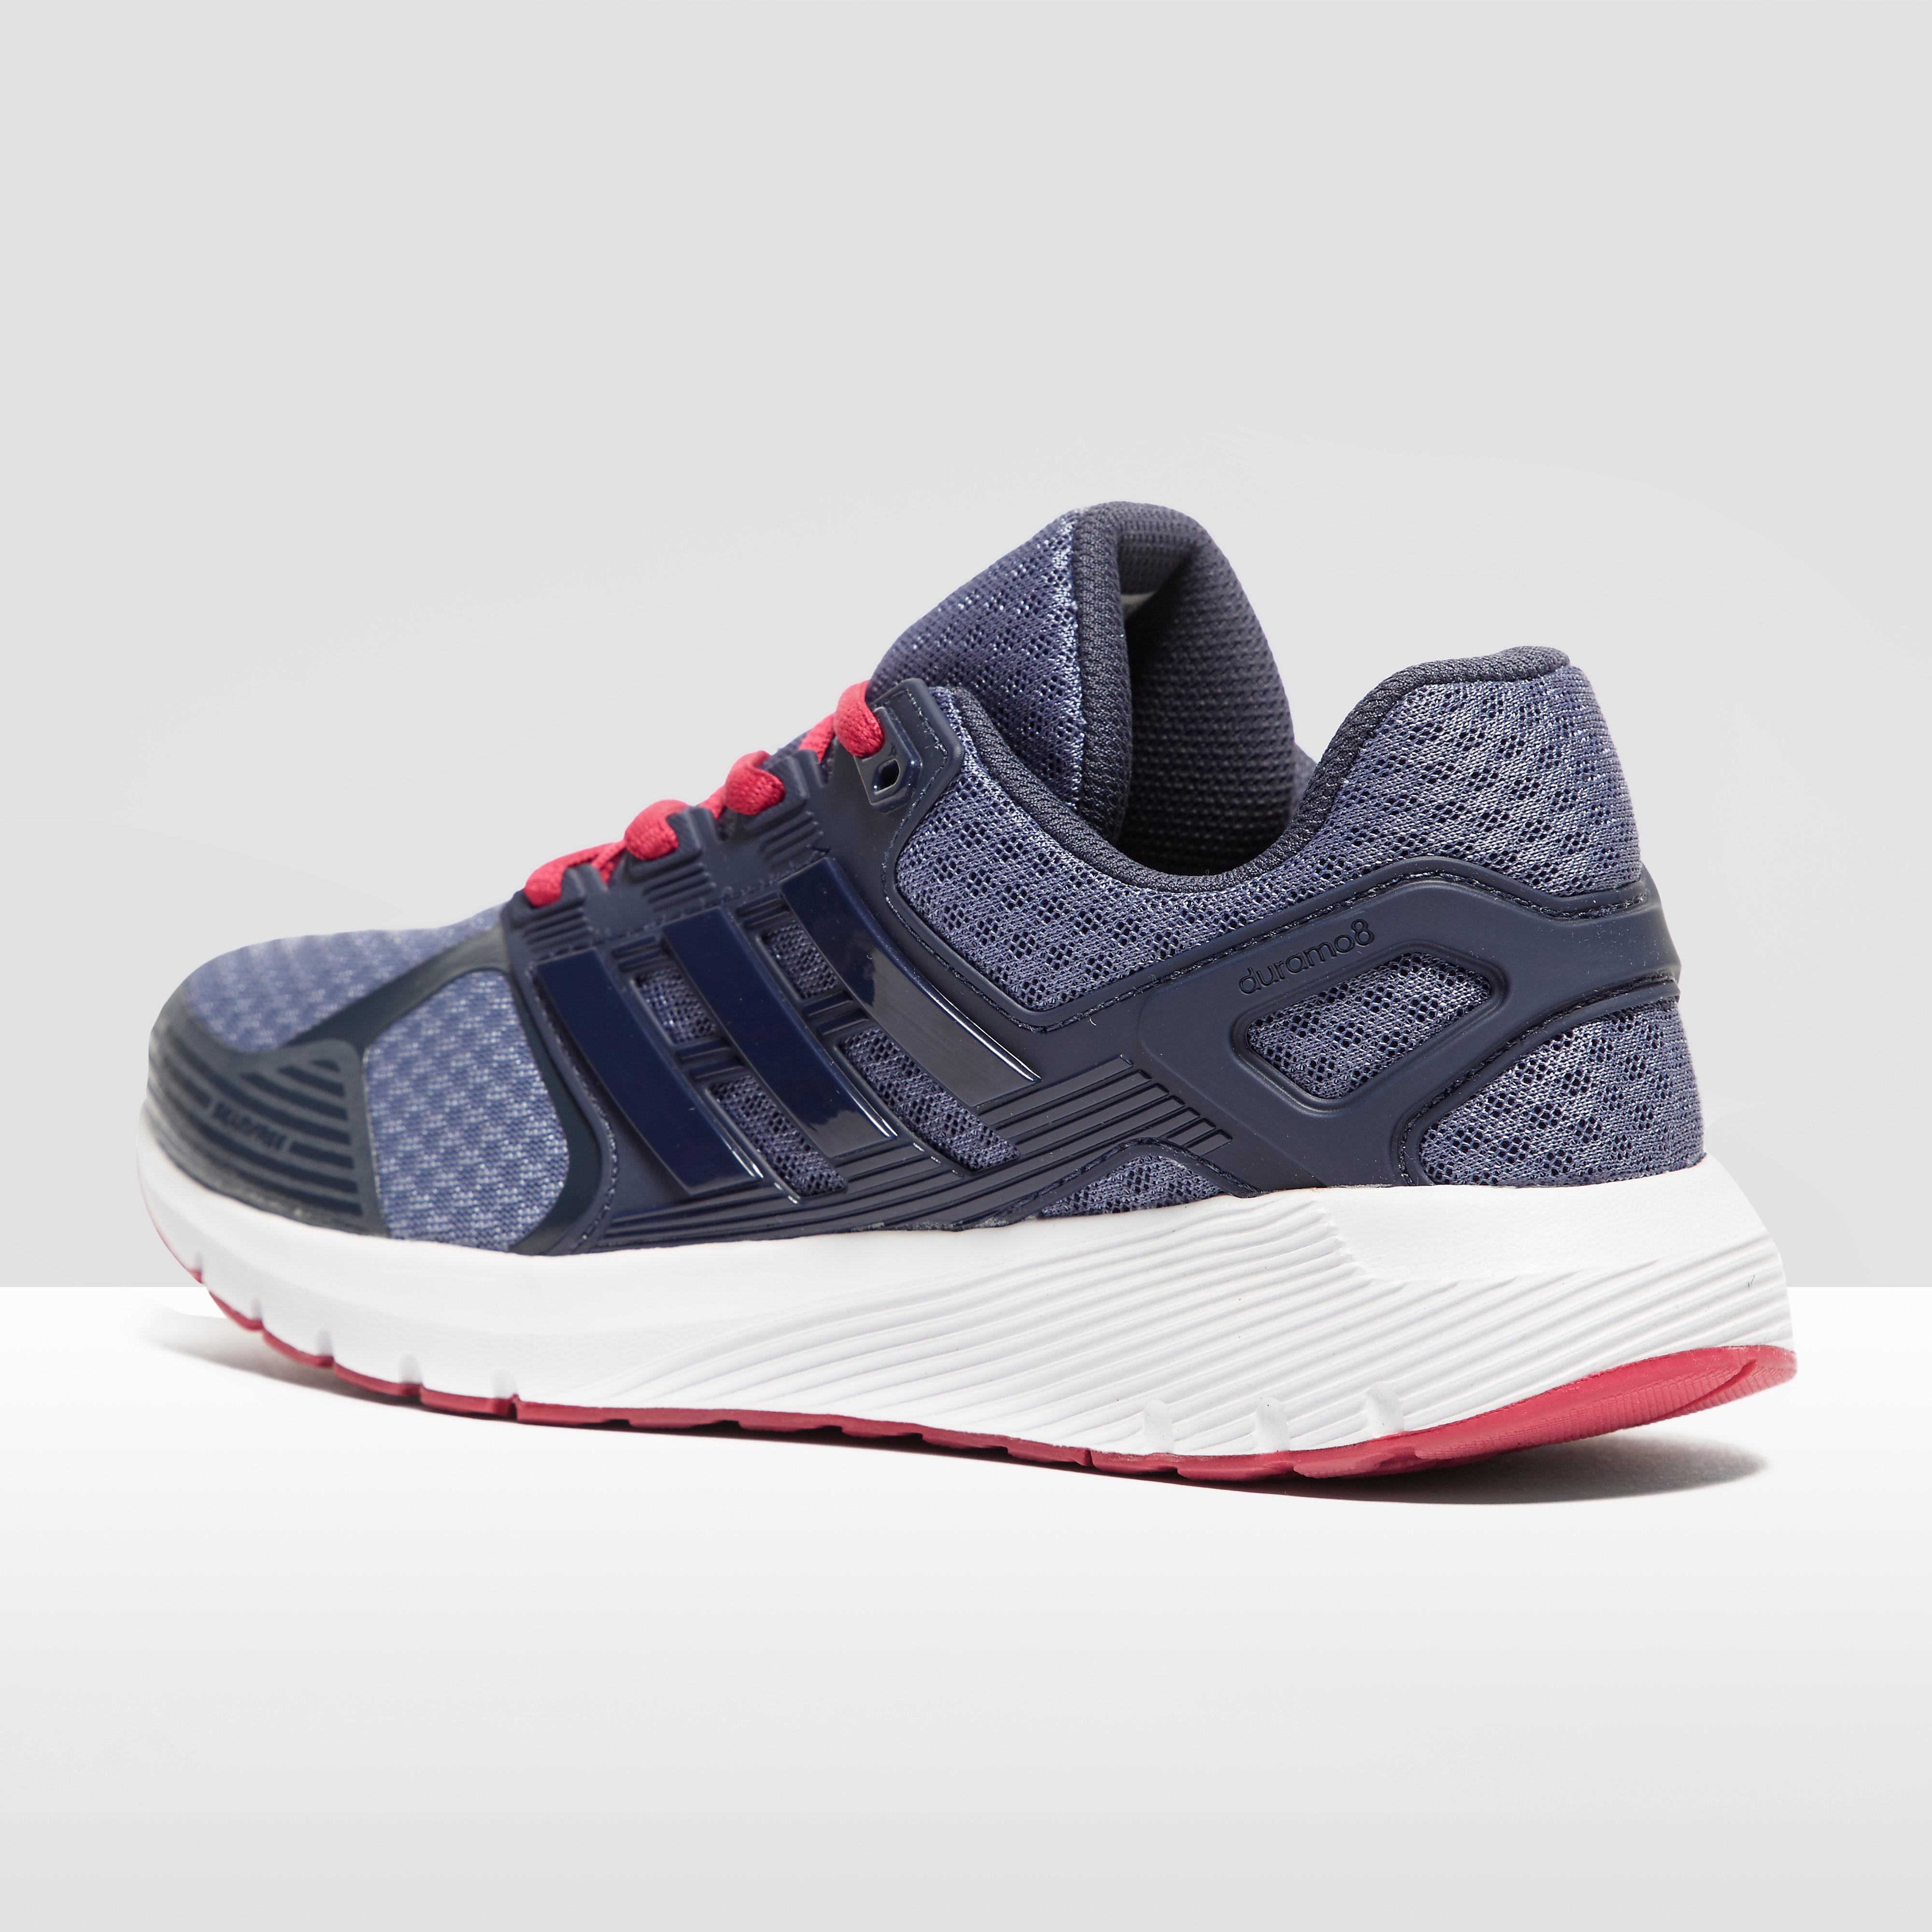 adidas Duramo 8 Men's Training Shoes